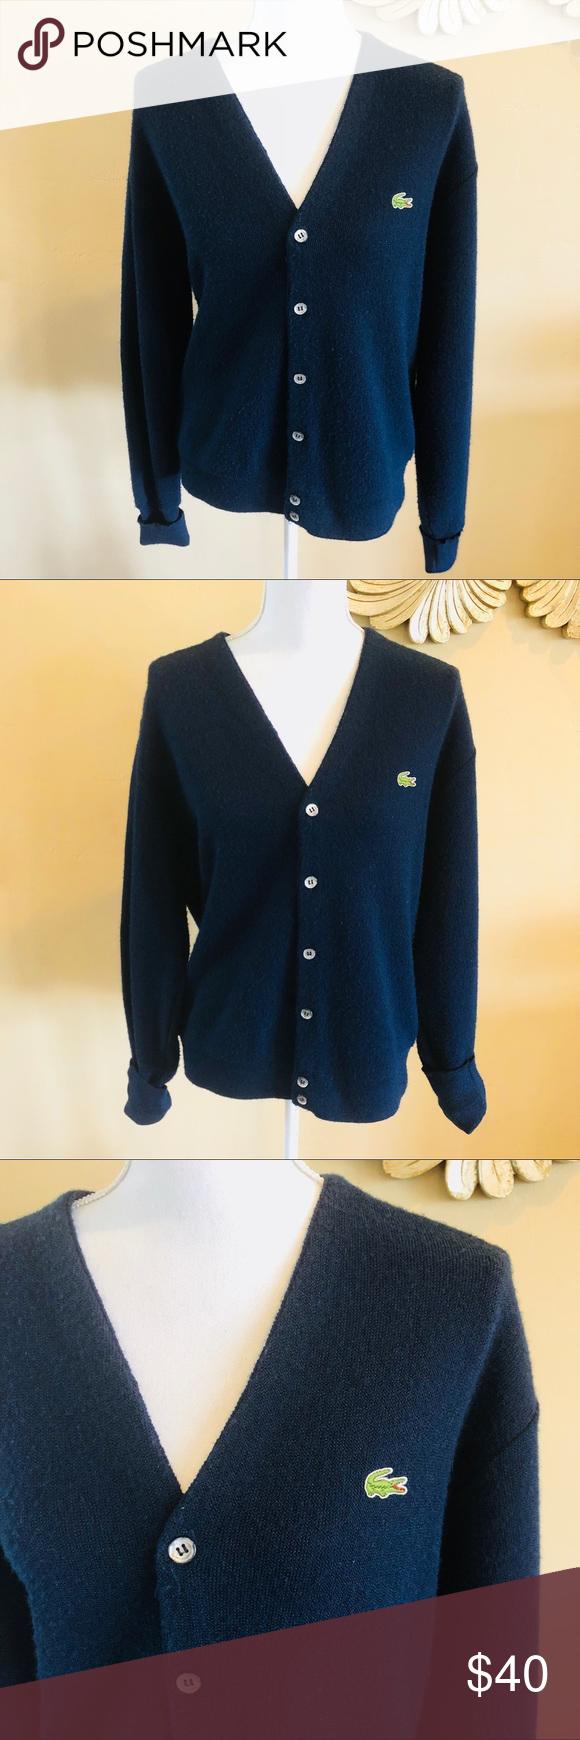 954f2c755   IZOD LACOSTE   Vintage Blue Cardigan Sweater